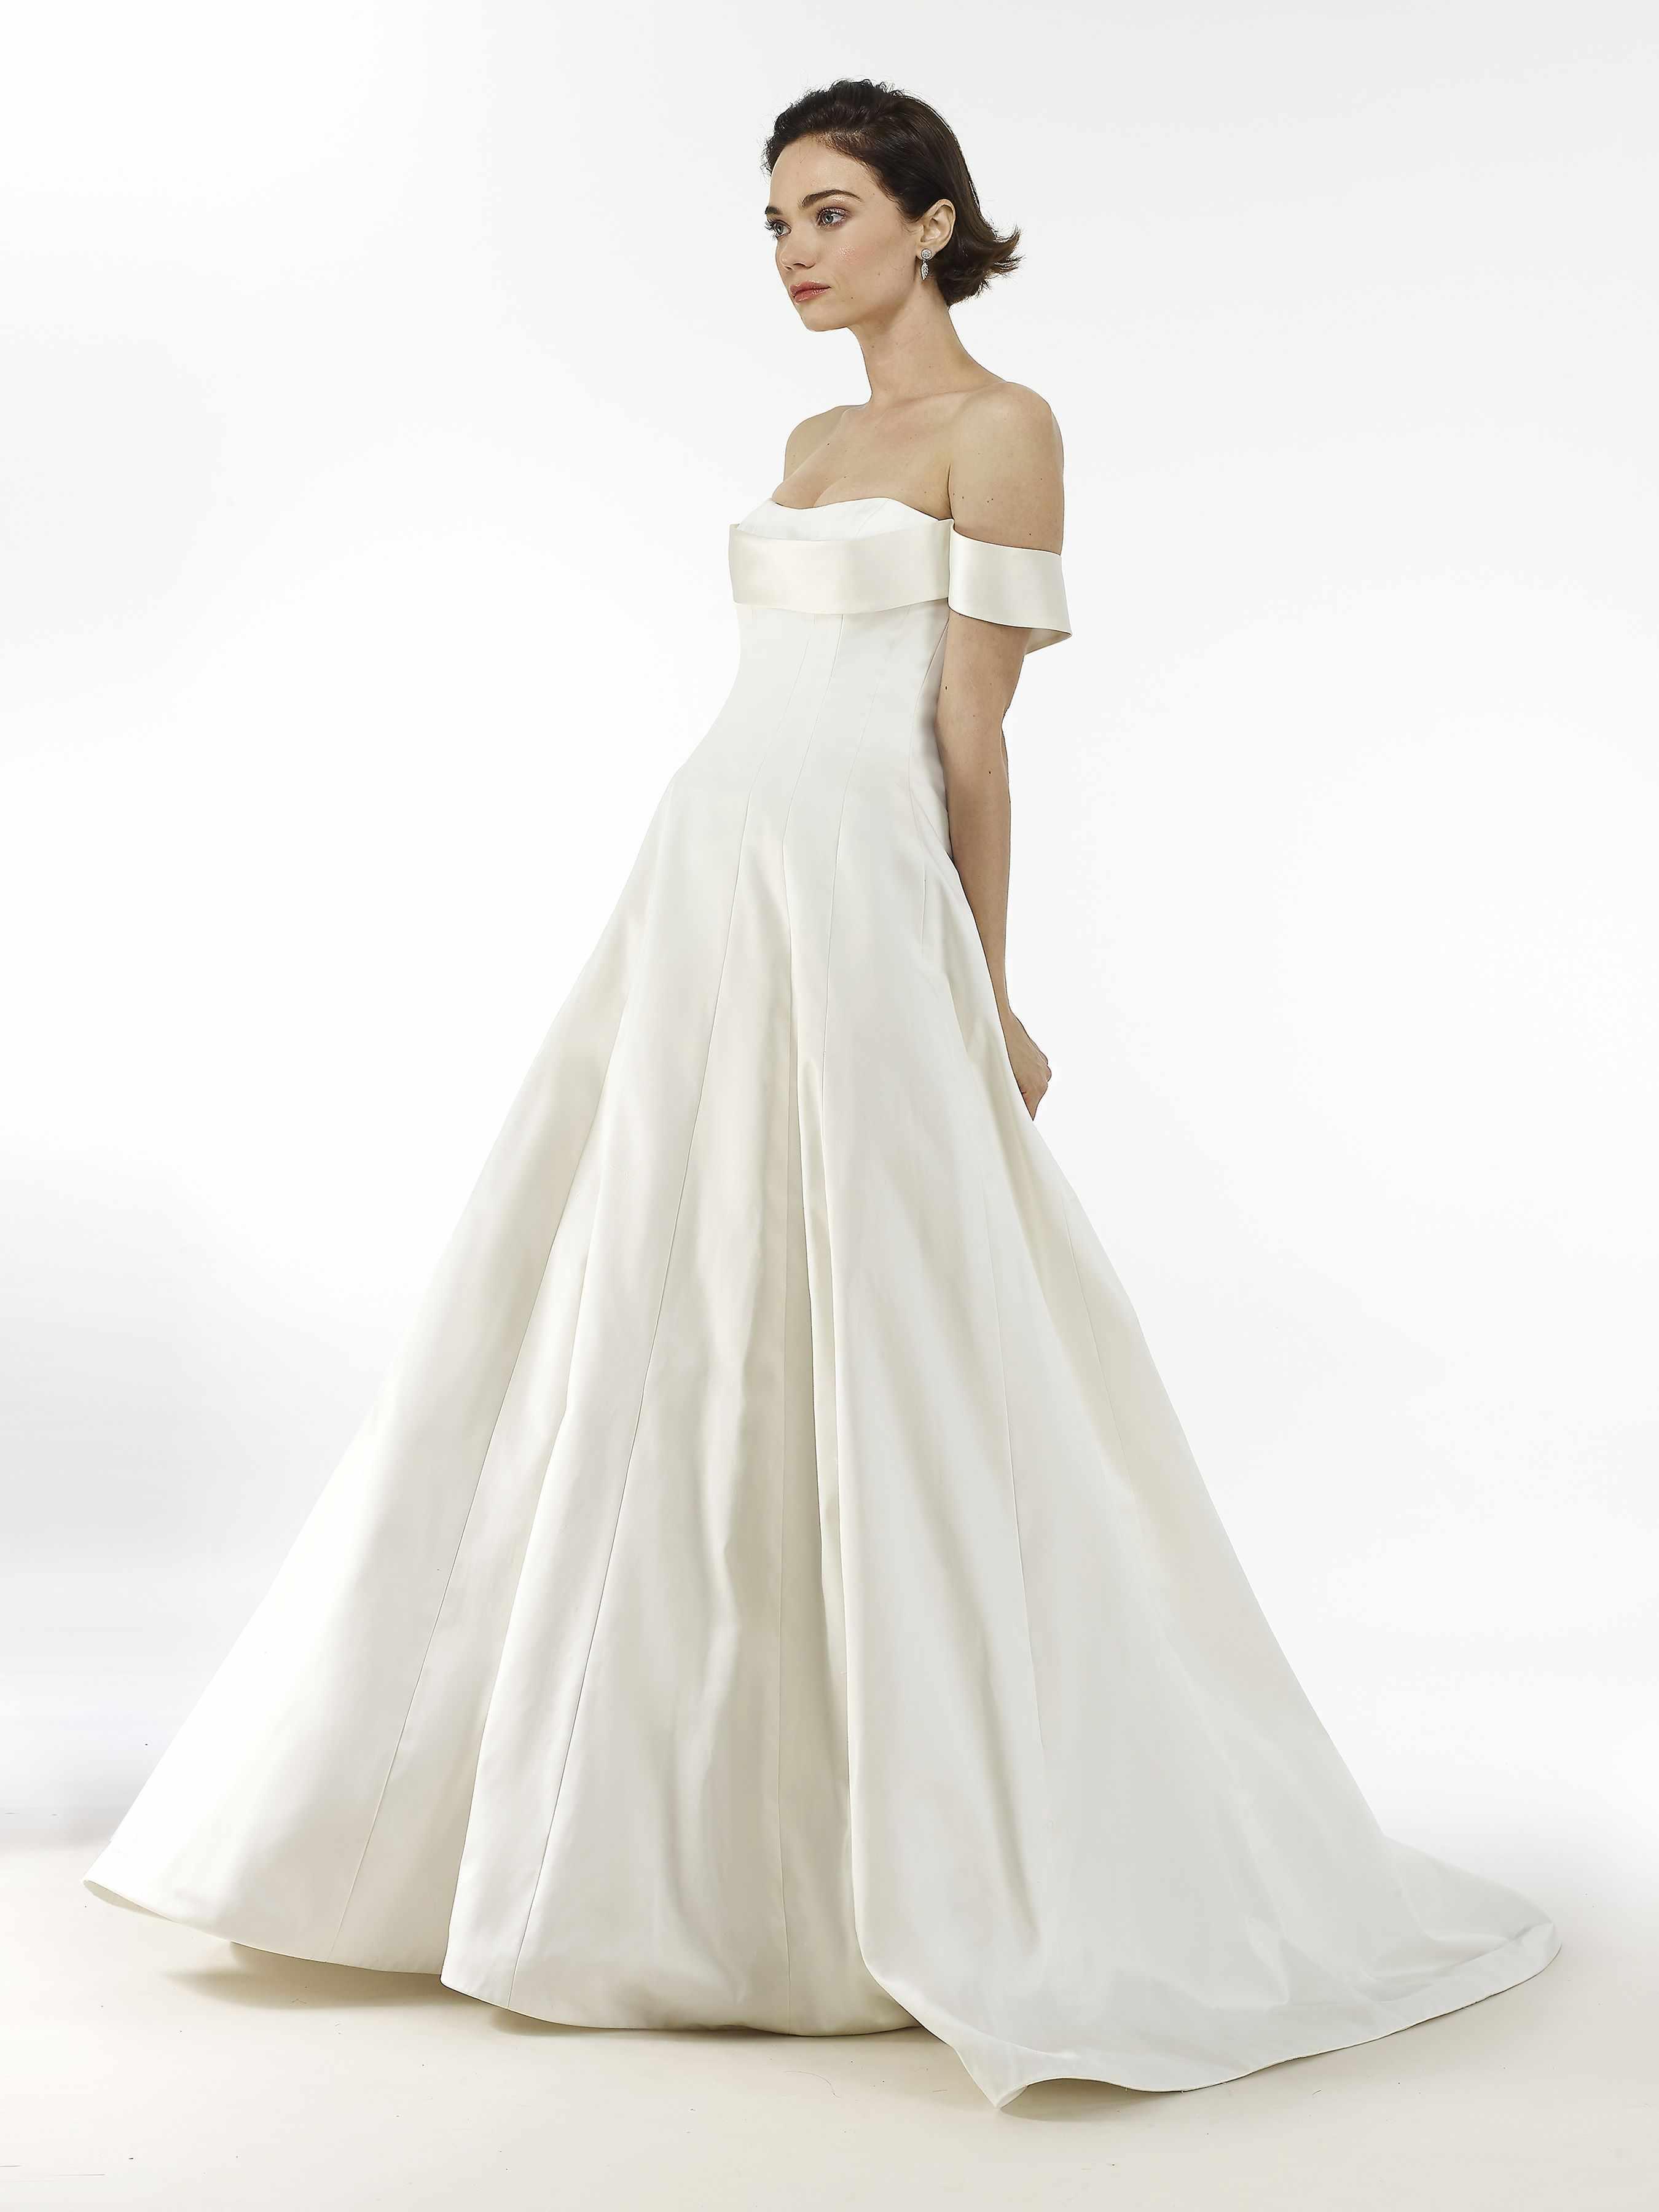 Model in off-the-shoulder ballgown